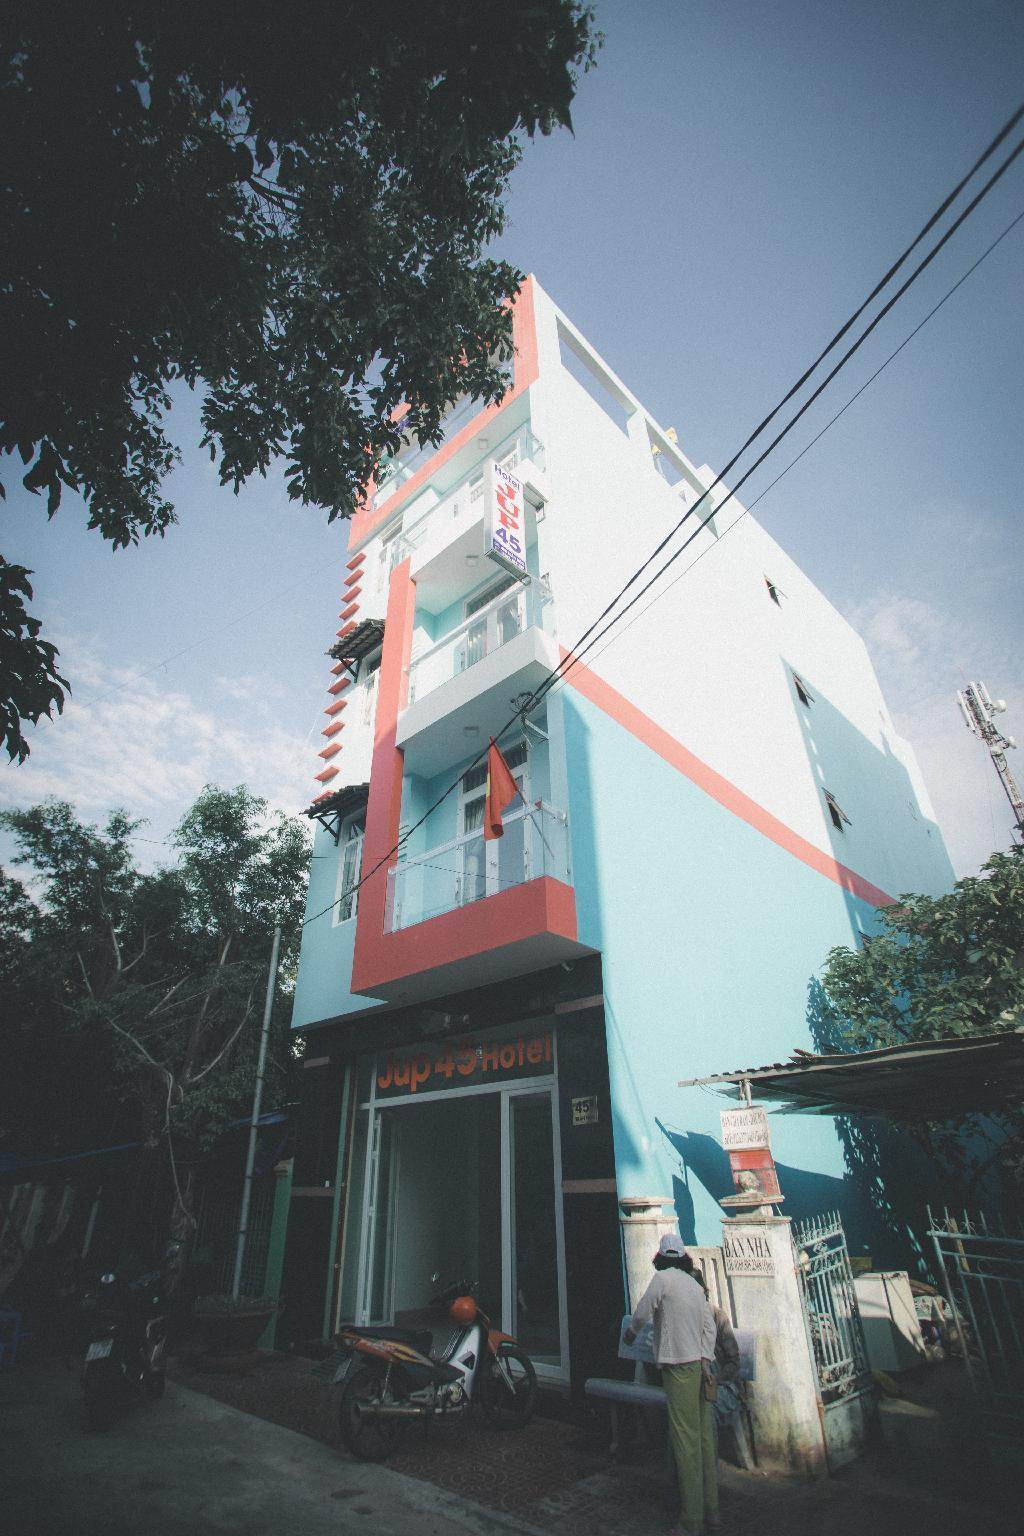 Jup45 Quy Nhon Hotel